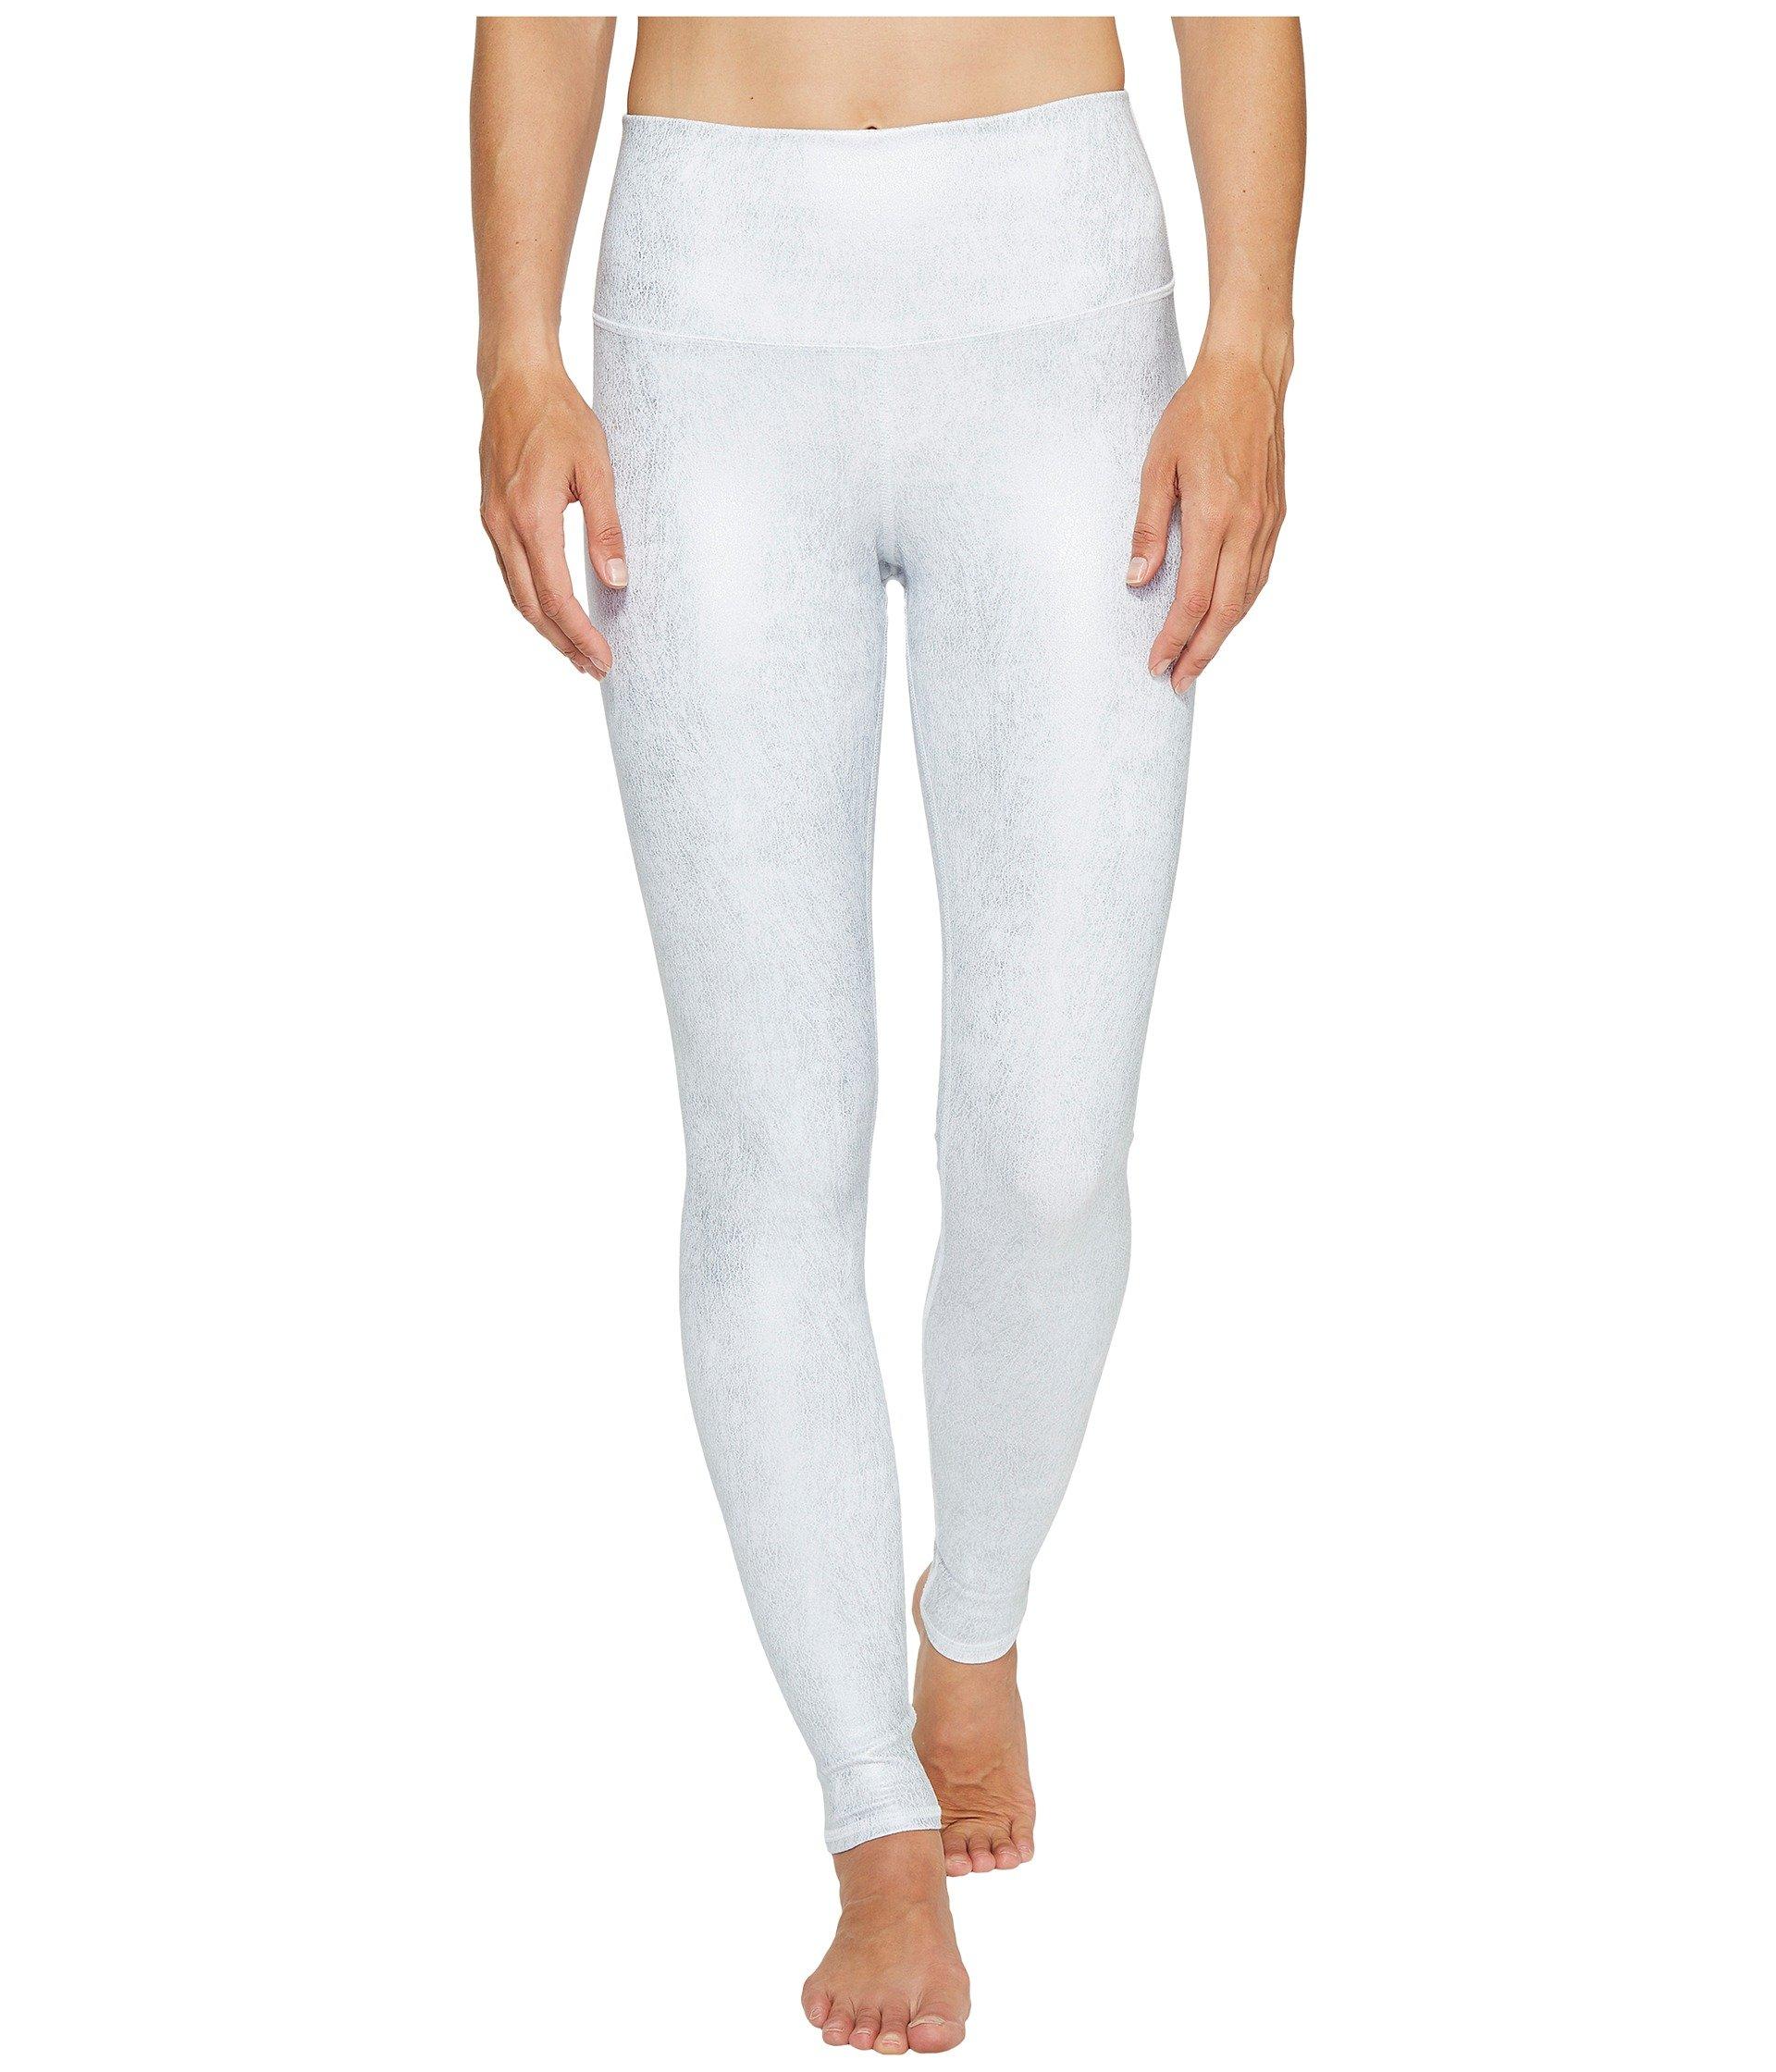 Alo Yoga Women's High Waist Airbrush Legging, Slate Metallic/White XX-Small